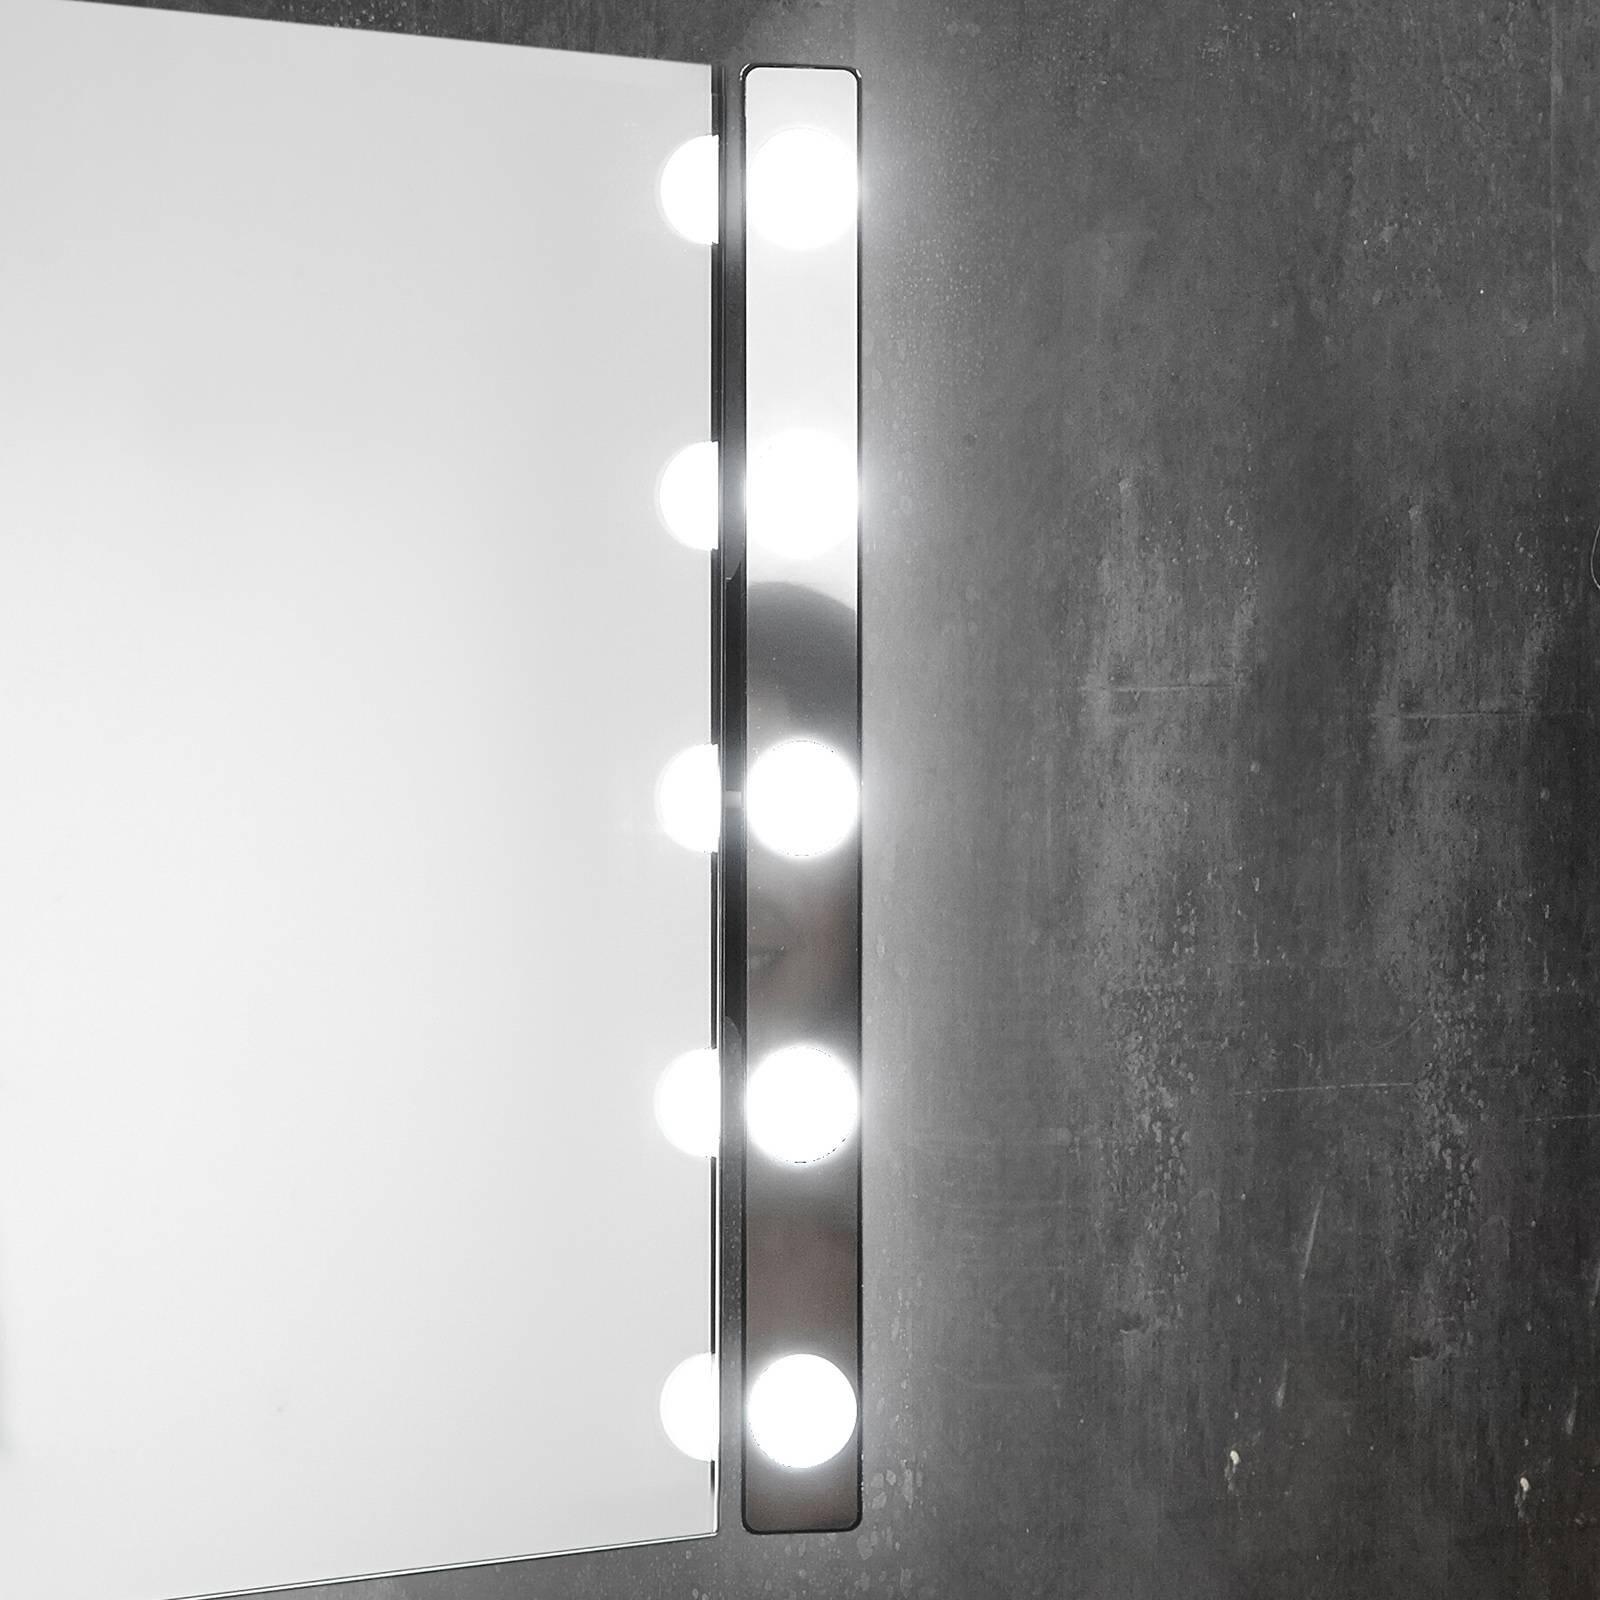 LED-speillampe Hollywood, 60 cm 5 lyskilder hvit